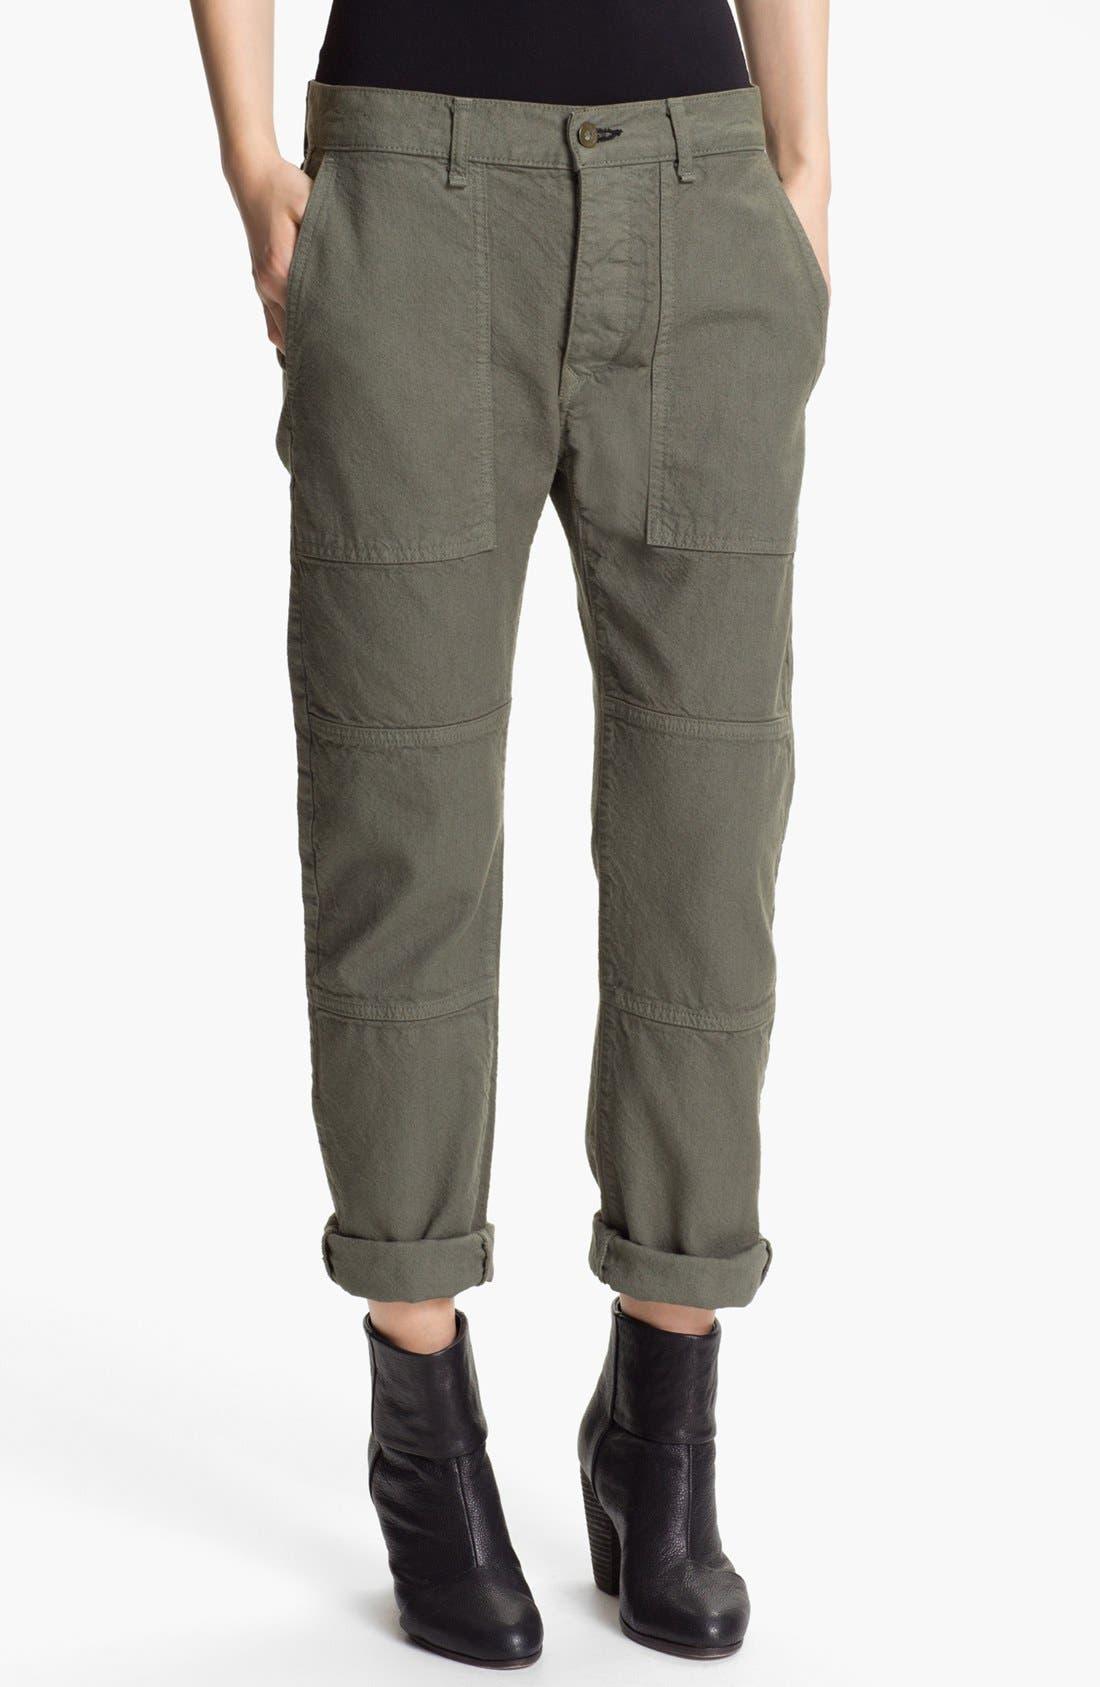 Alternate Image 1 Selected - rag & bone/JEAN 'Brigade' Cargo Twill Pants